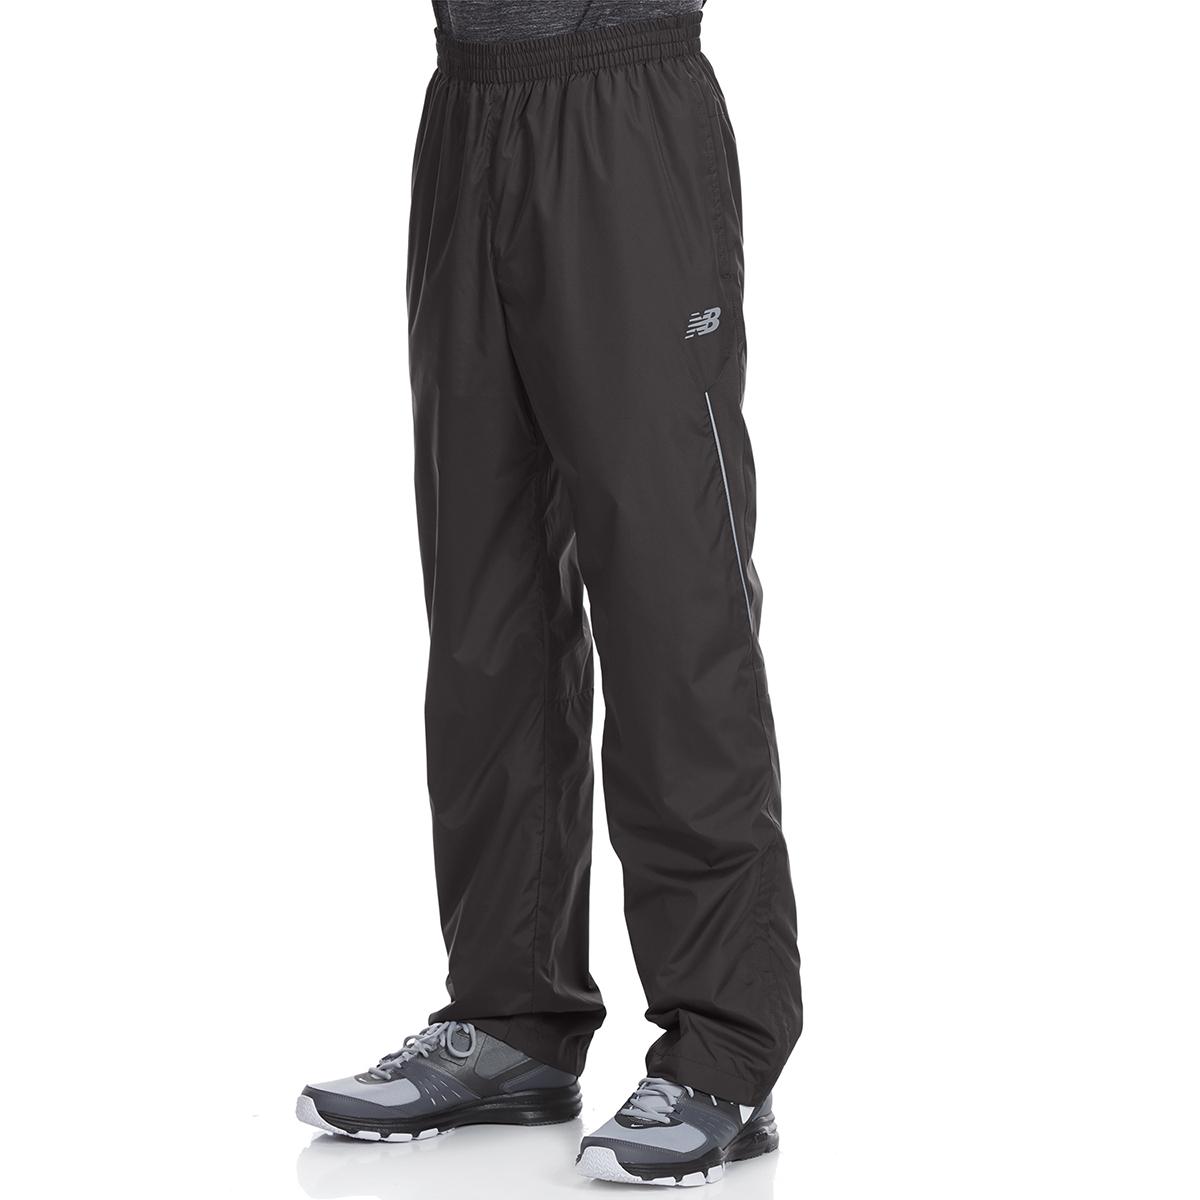 New Balance Men's Wind Pants With Mesh Trim - Black, XXL